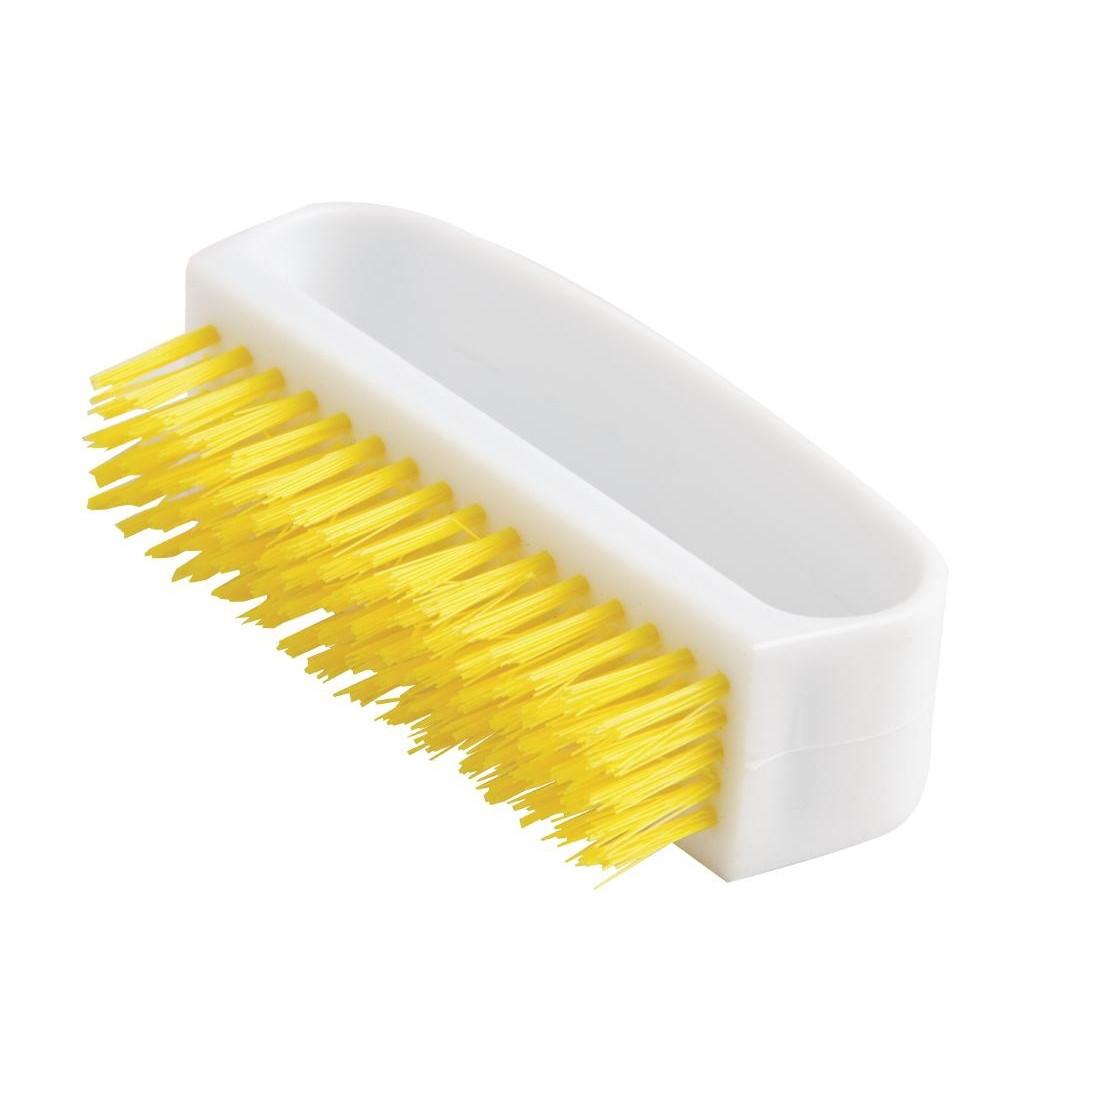 Jantex Nail Brush Yellow | Hand Brushes | Dustpan and Brushes ...